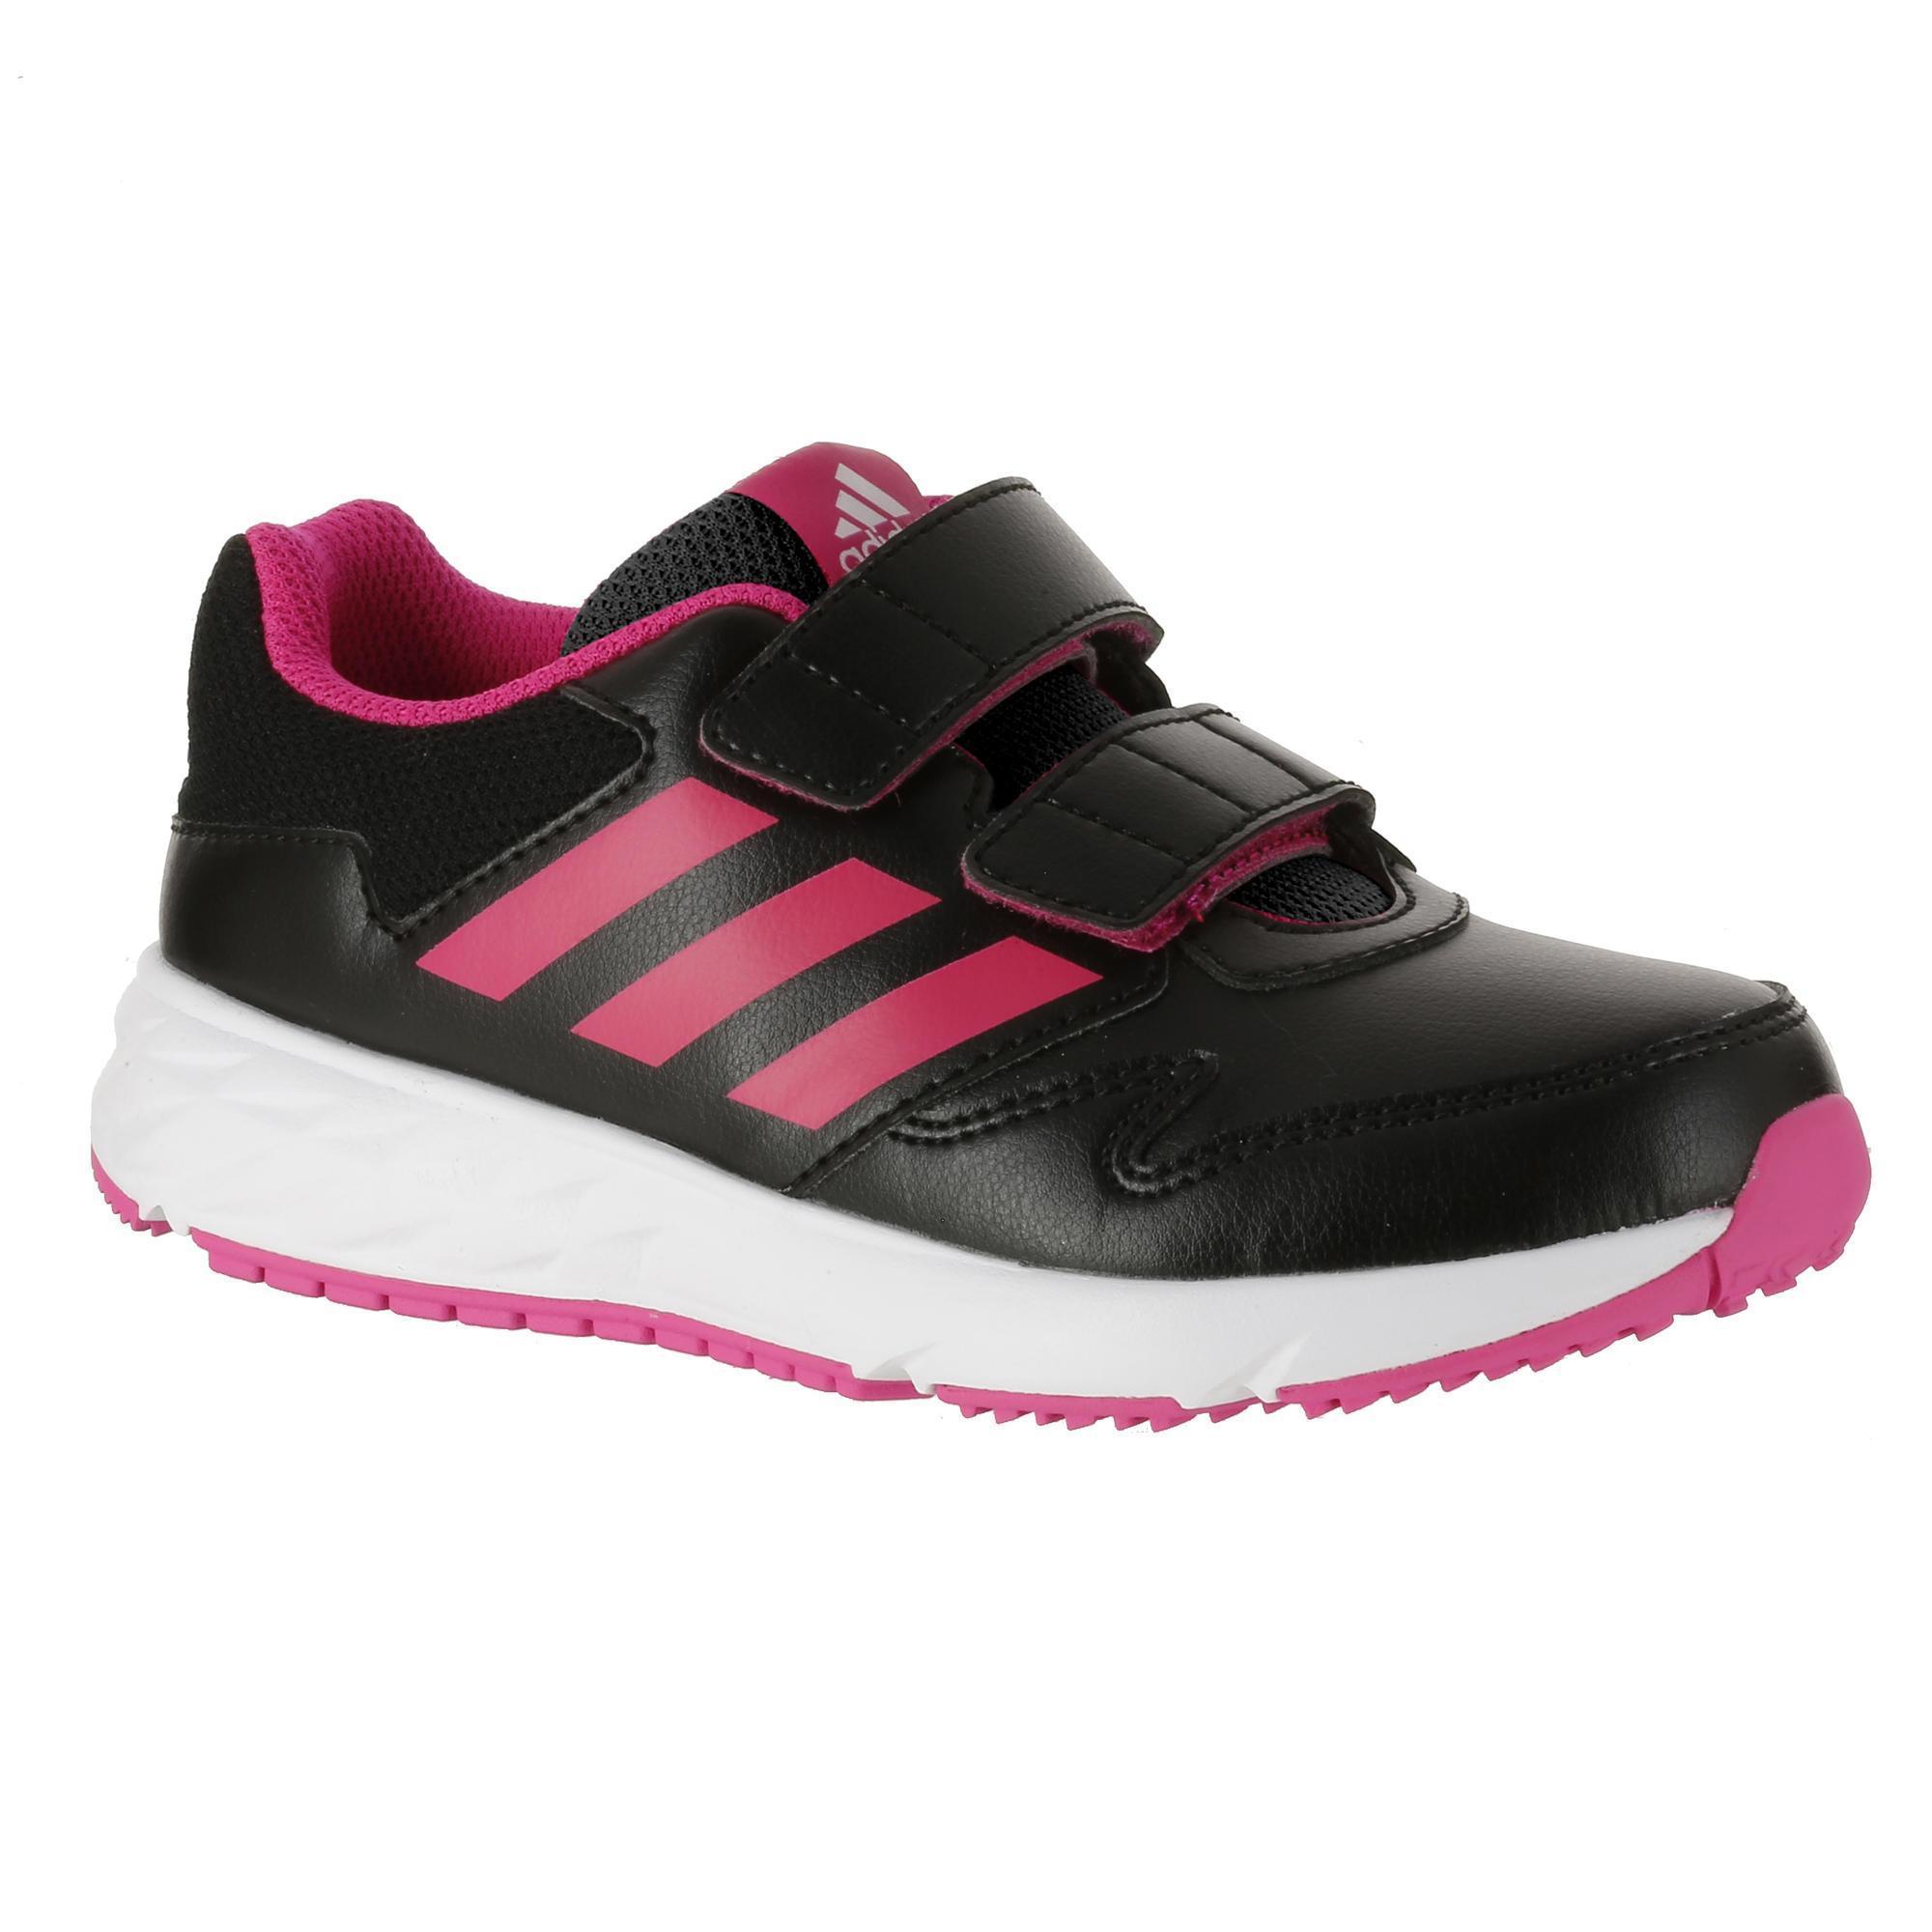 Adidas Kindersneakers Fastwalk2 klittenband zwart/roze